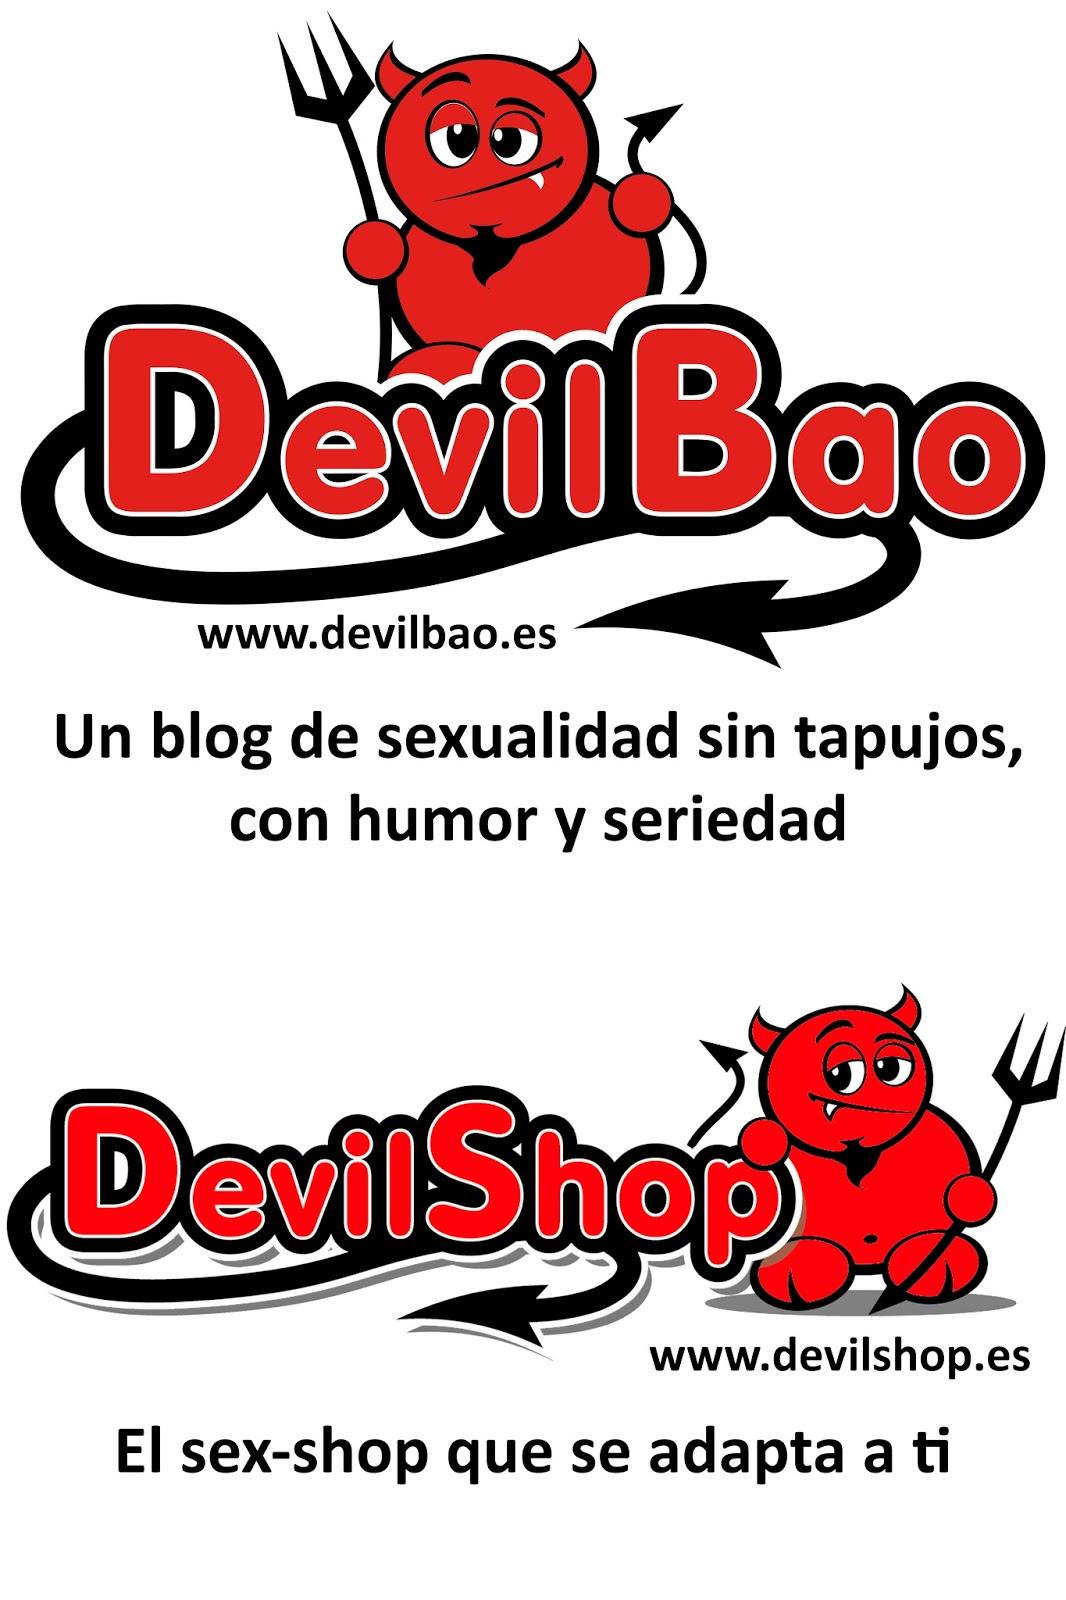 www.devilbao.es